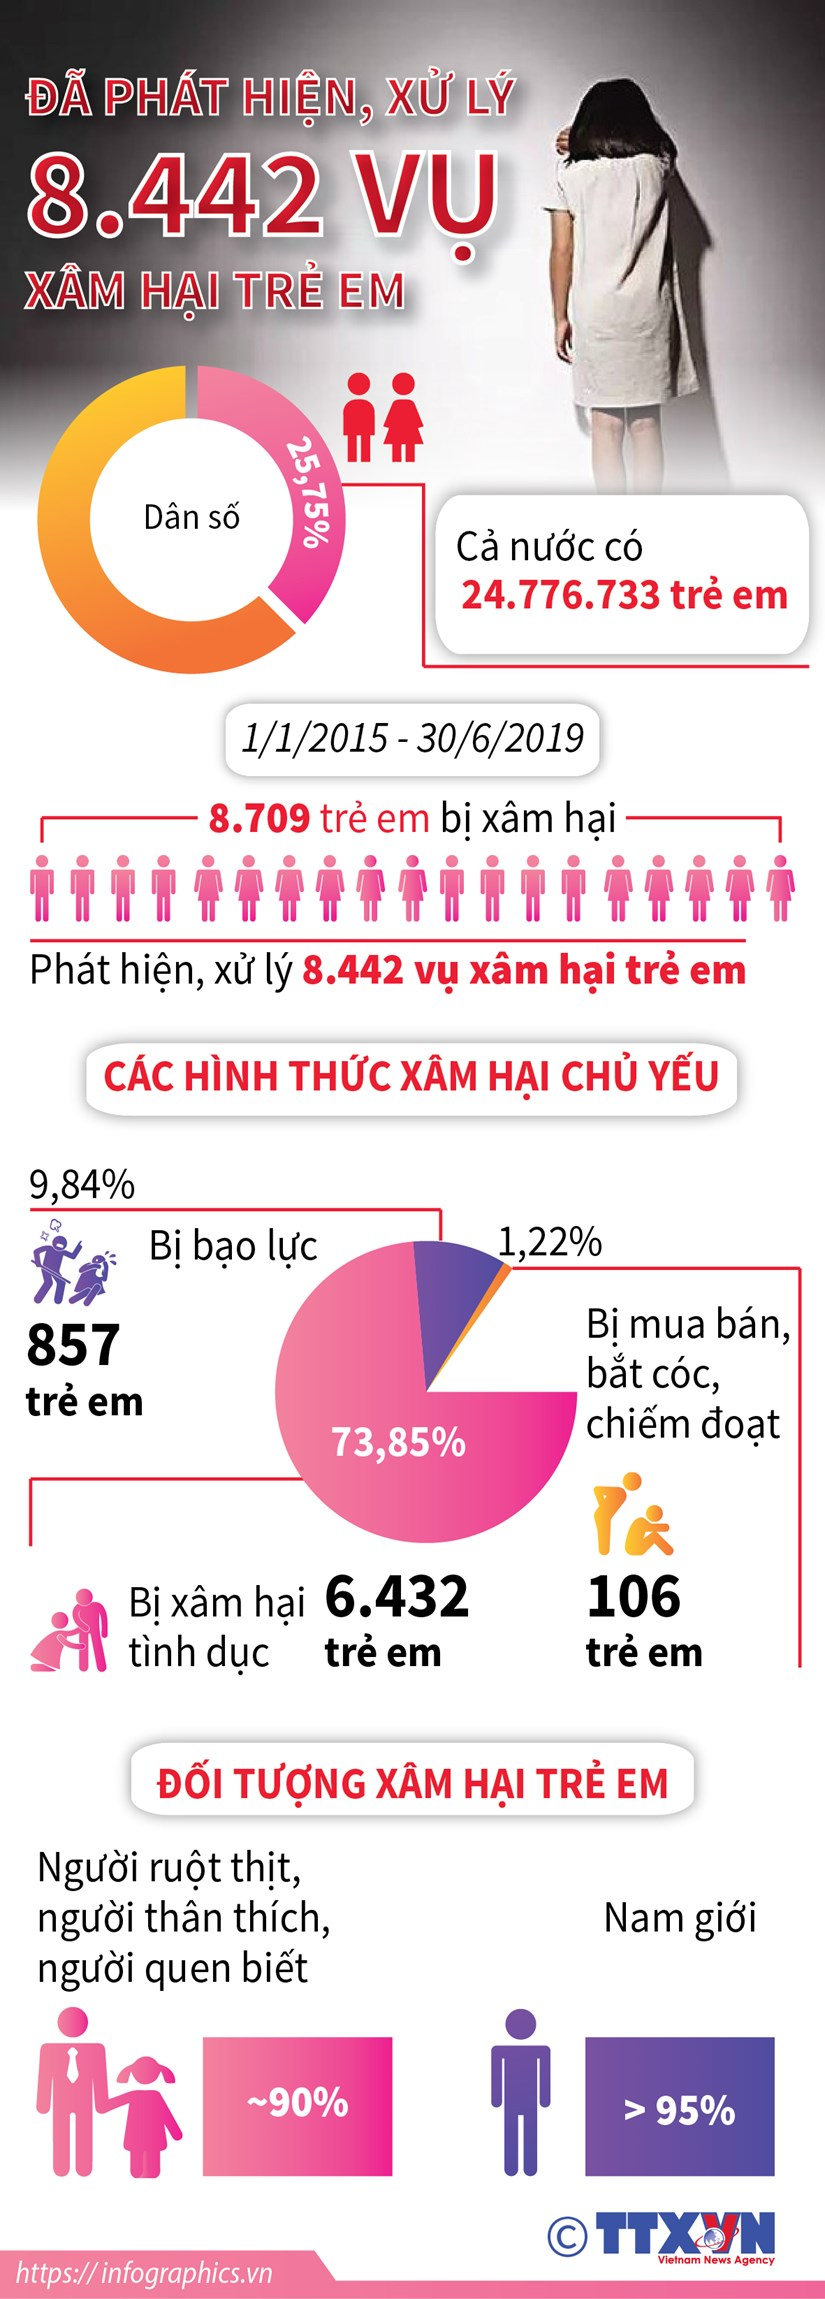 [Infographics] Da phat hien, xu ly 8.442 vu xam hai tre em hinh anh 1